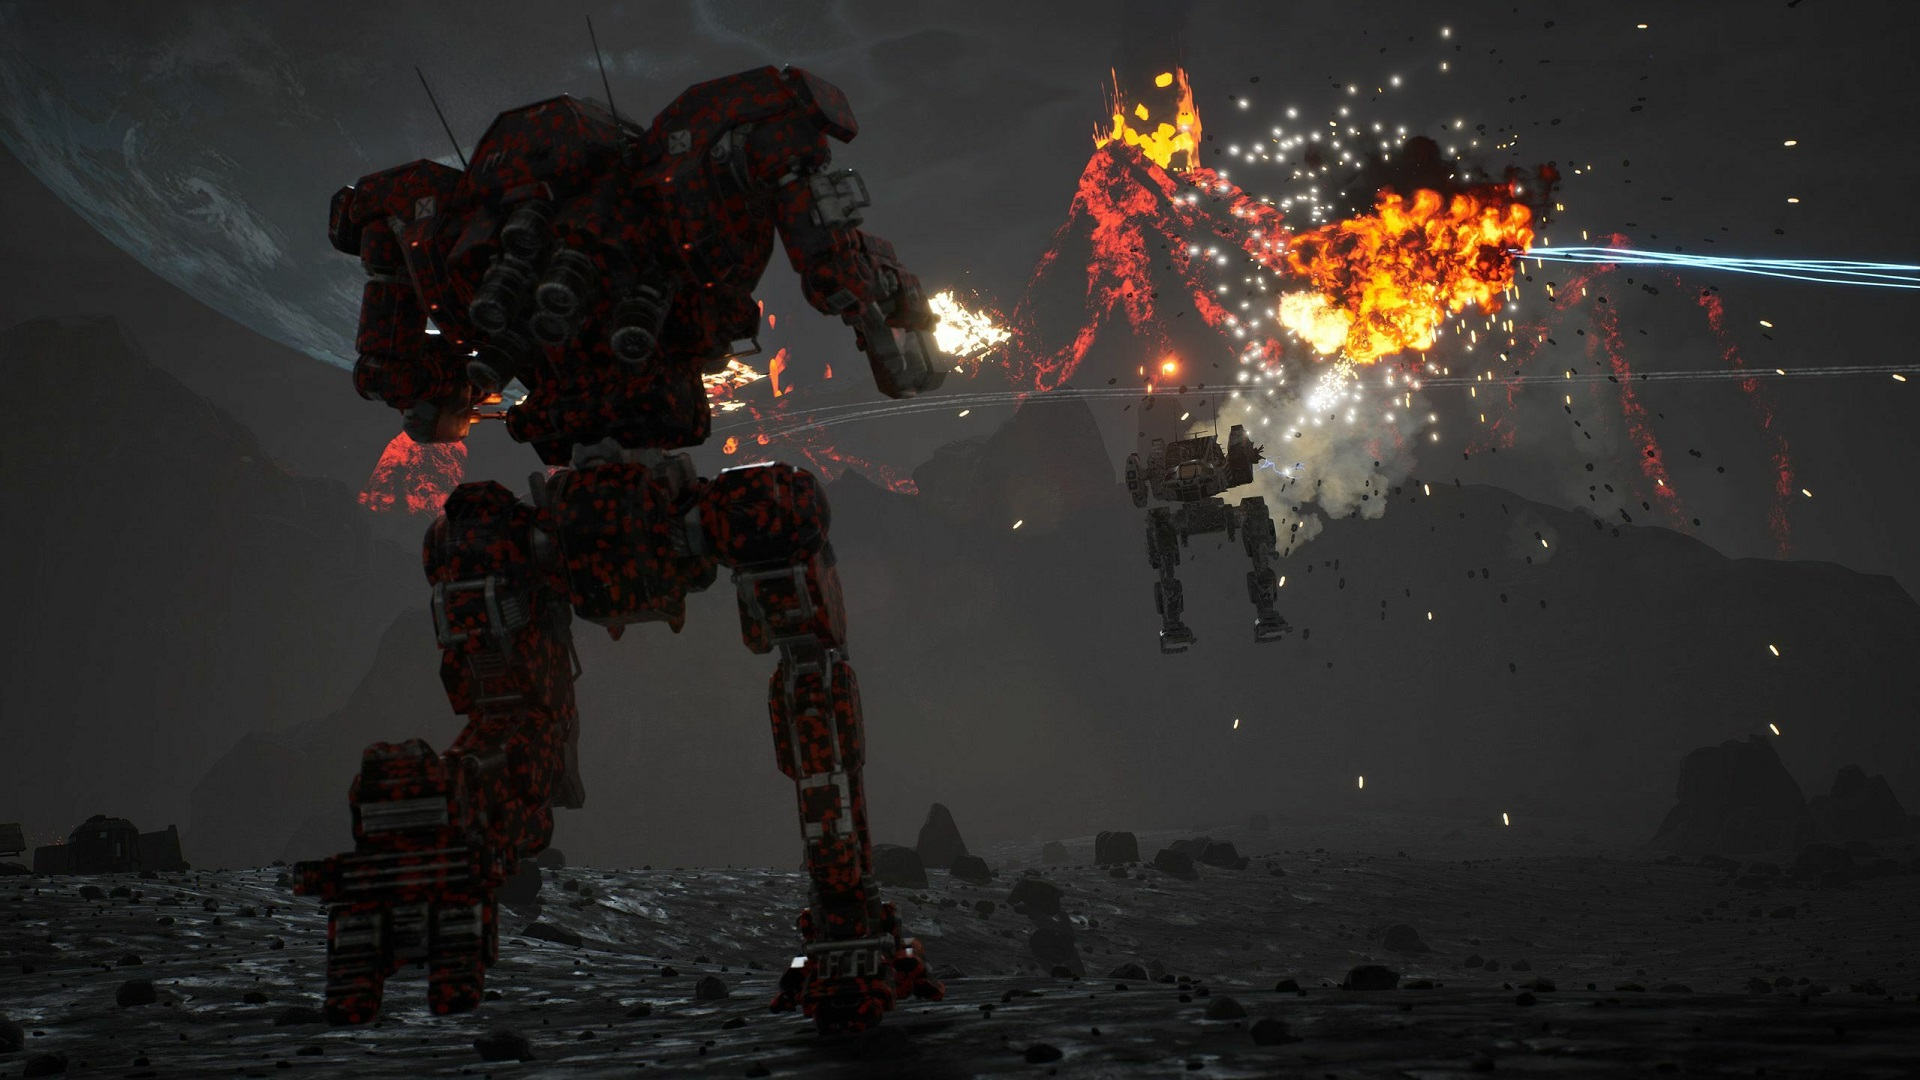 mechwarrior-5-mercenaries-dropship-pc-screenshot-4